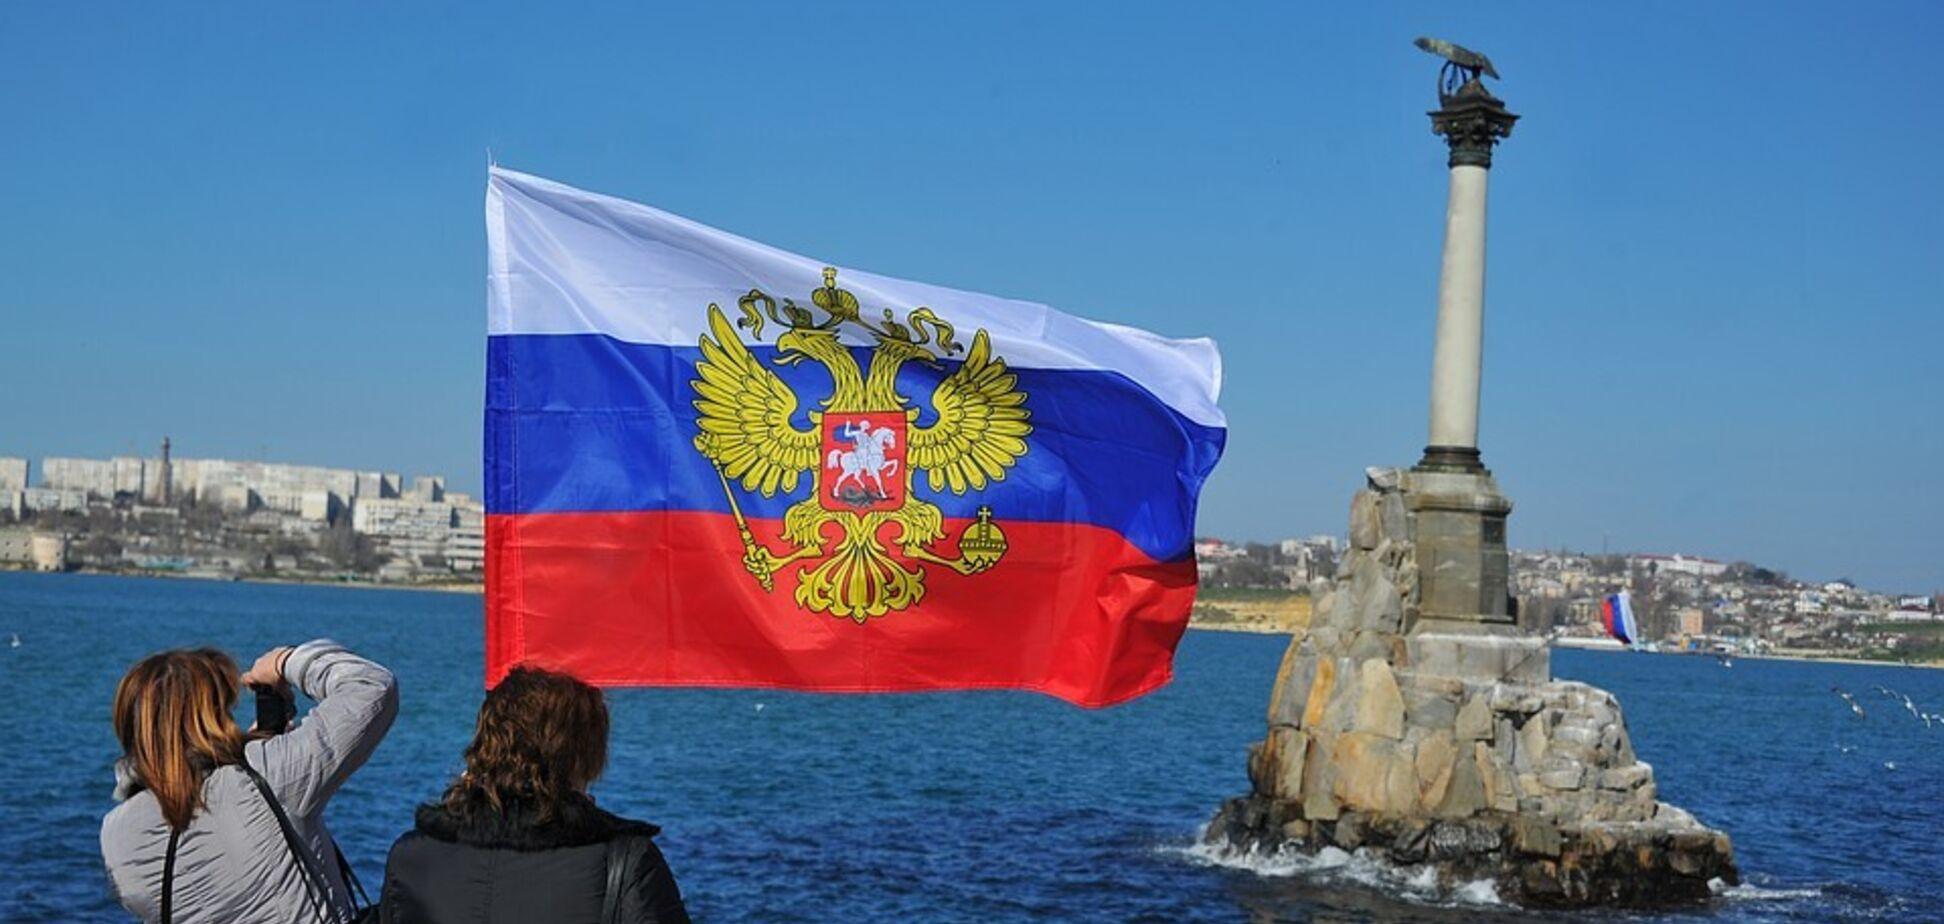 Просять запастися водою та їжею: окупанти визнали нову катастрофу в Криму